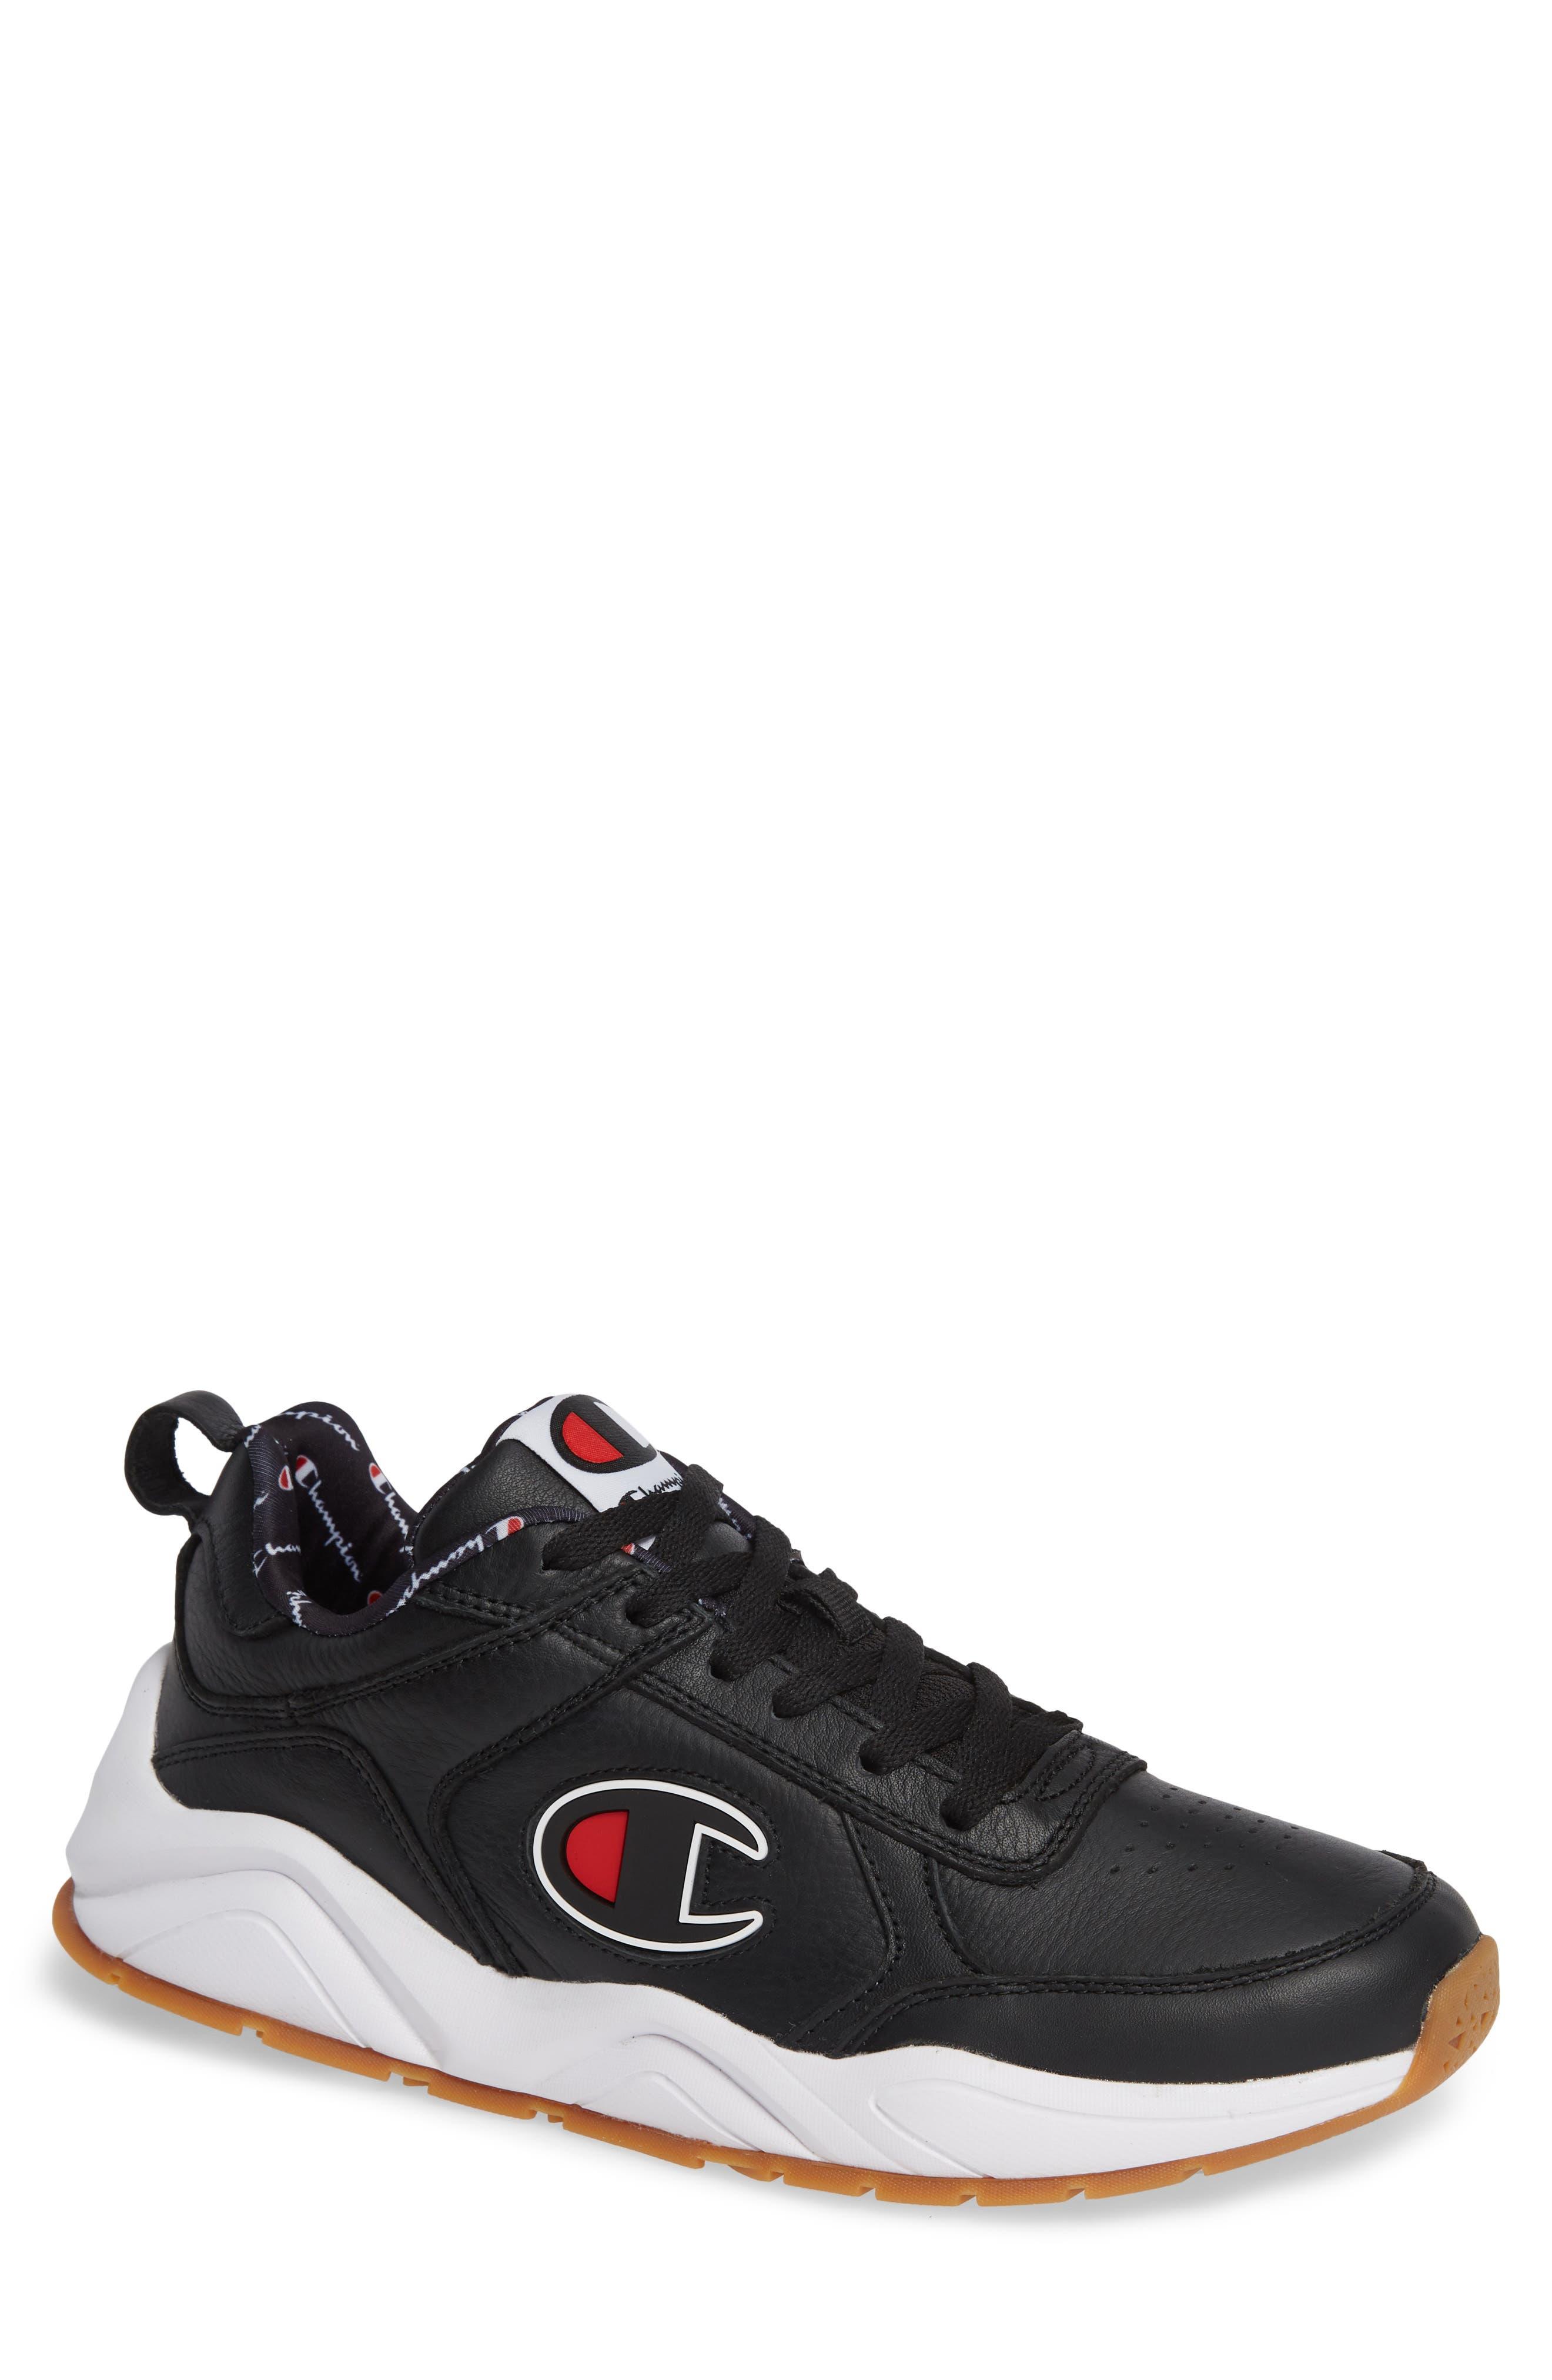 Bones Big-C Sneaker,                             Main thumbnail 1, color,                             BLACK LEATHER